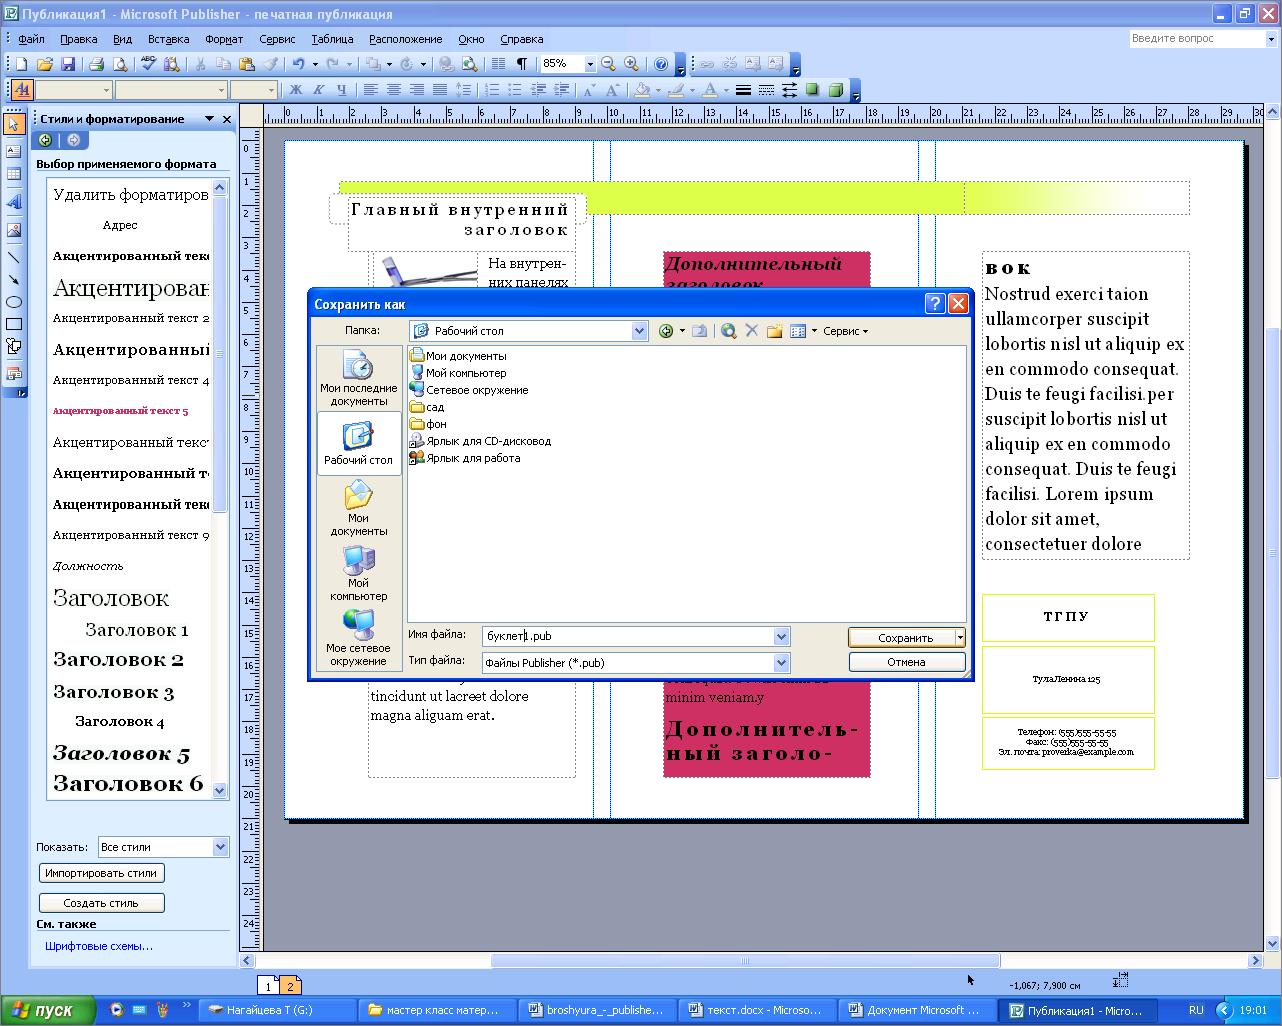 C:\Users\Андрей\Desktop\12.png